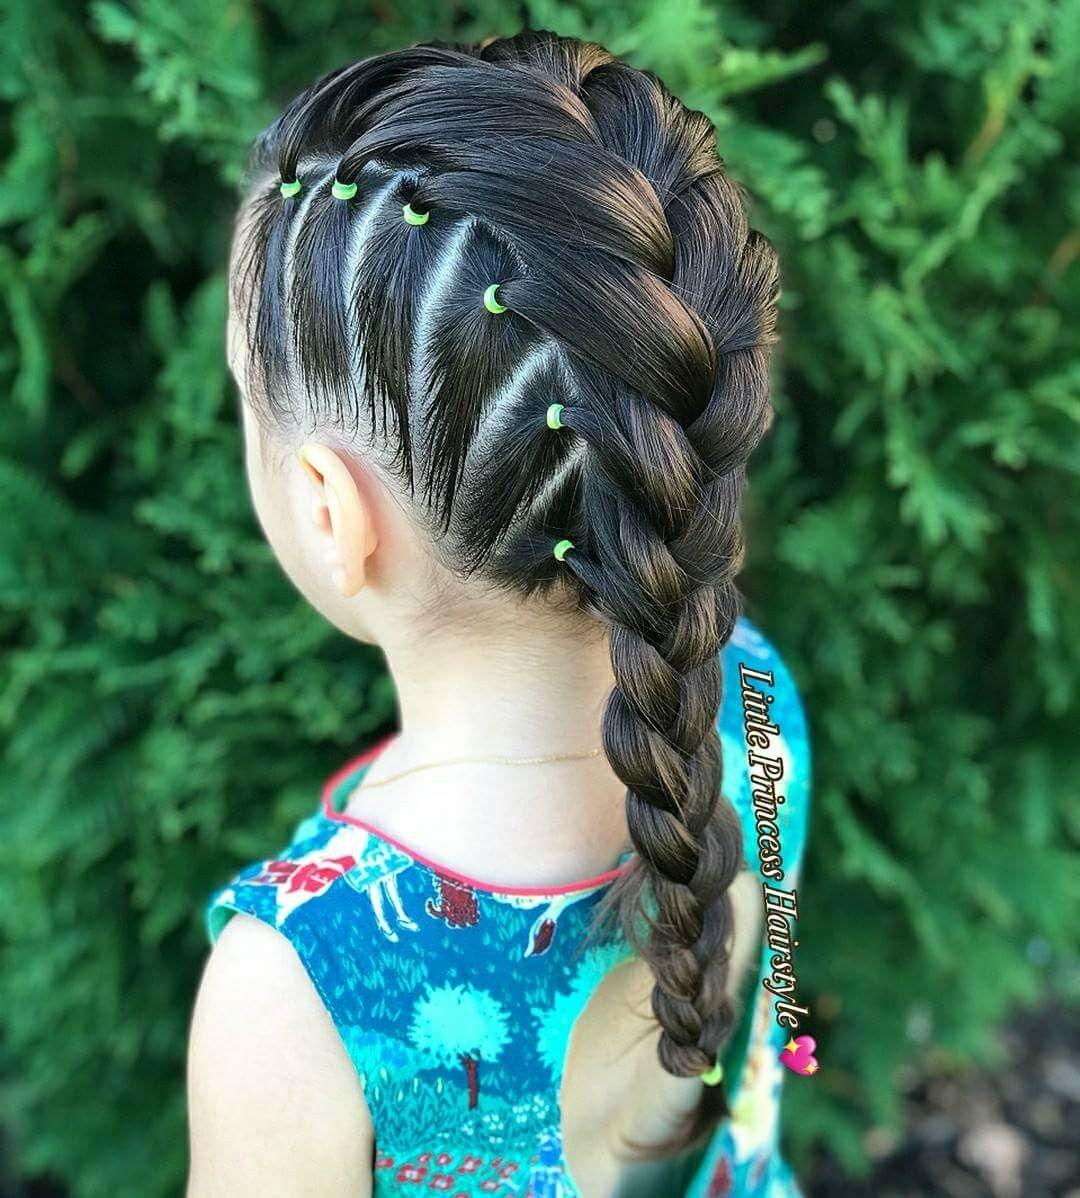 Pin by shay mavis on kids hair ideas pinterest hair style girl